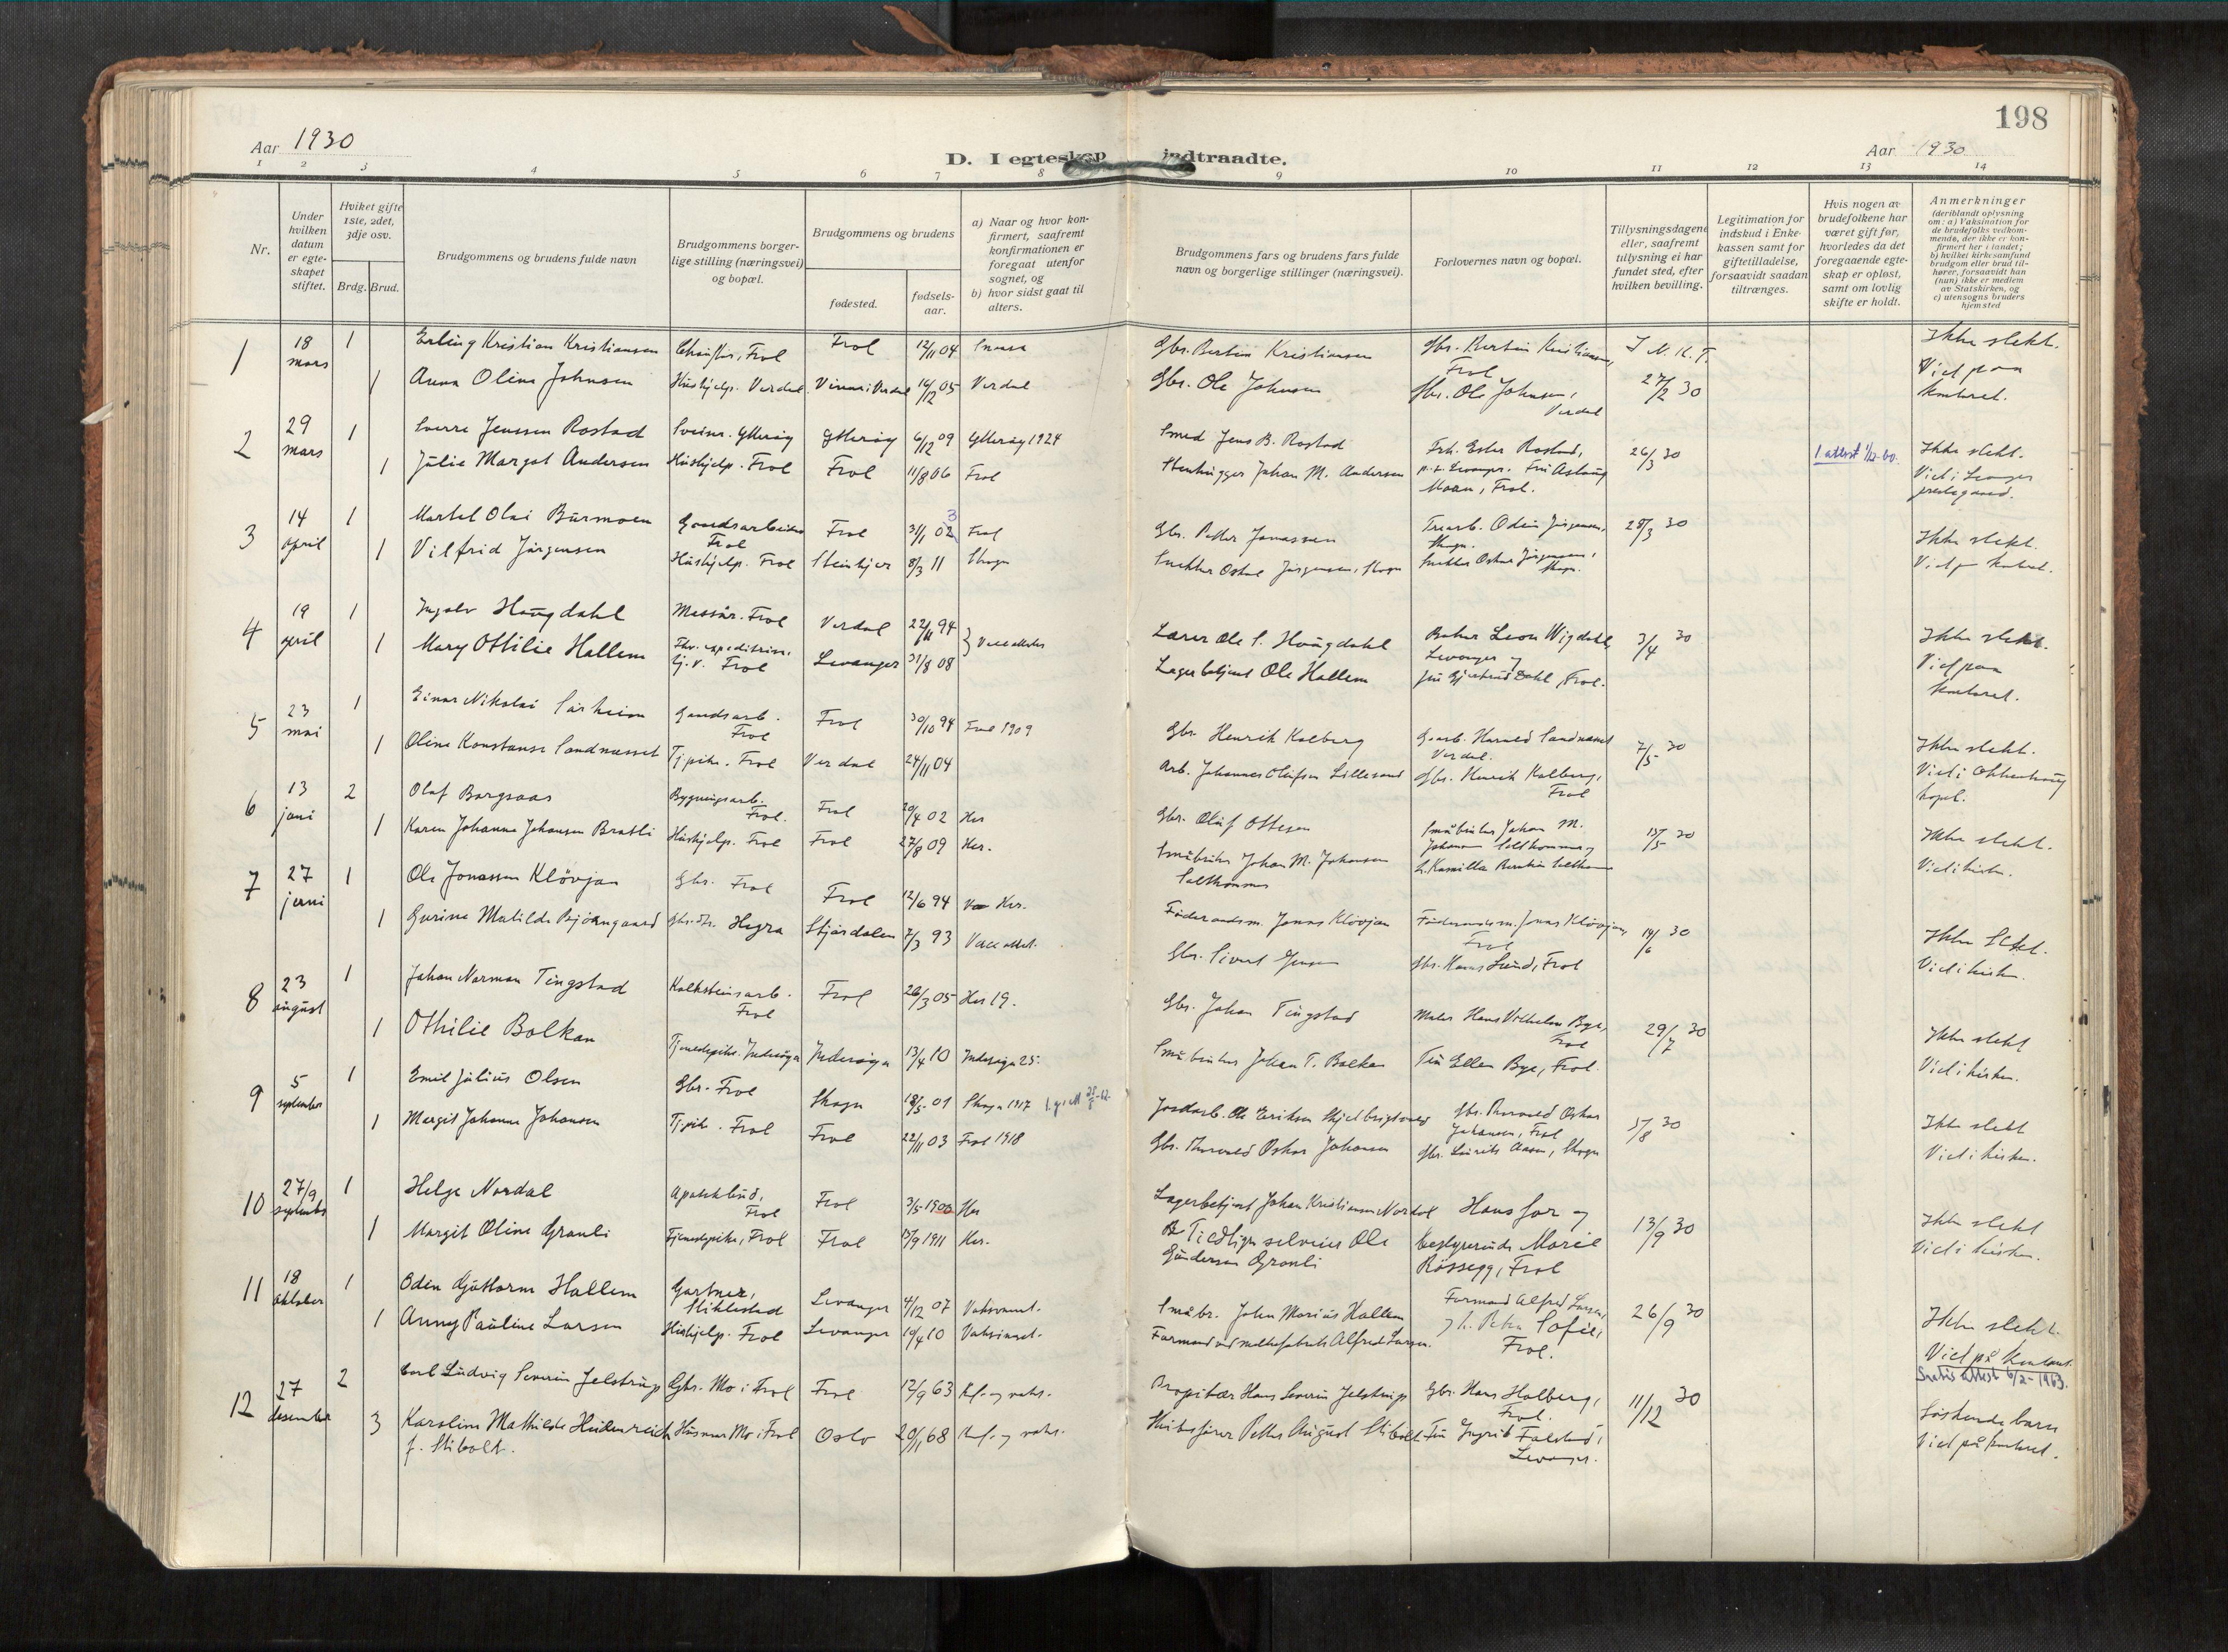 SAT, Levanger sokneprestkontor*, Parish register (official) no. 1, 1912-1935, p. 198